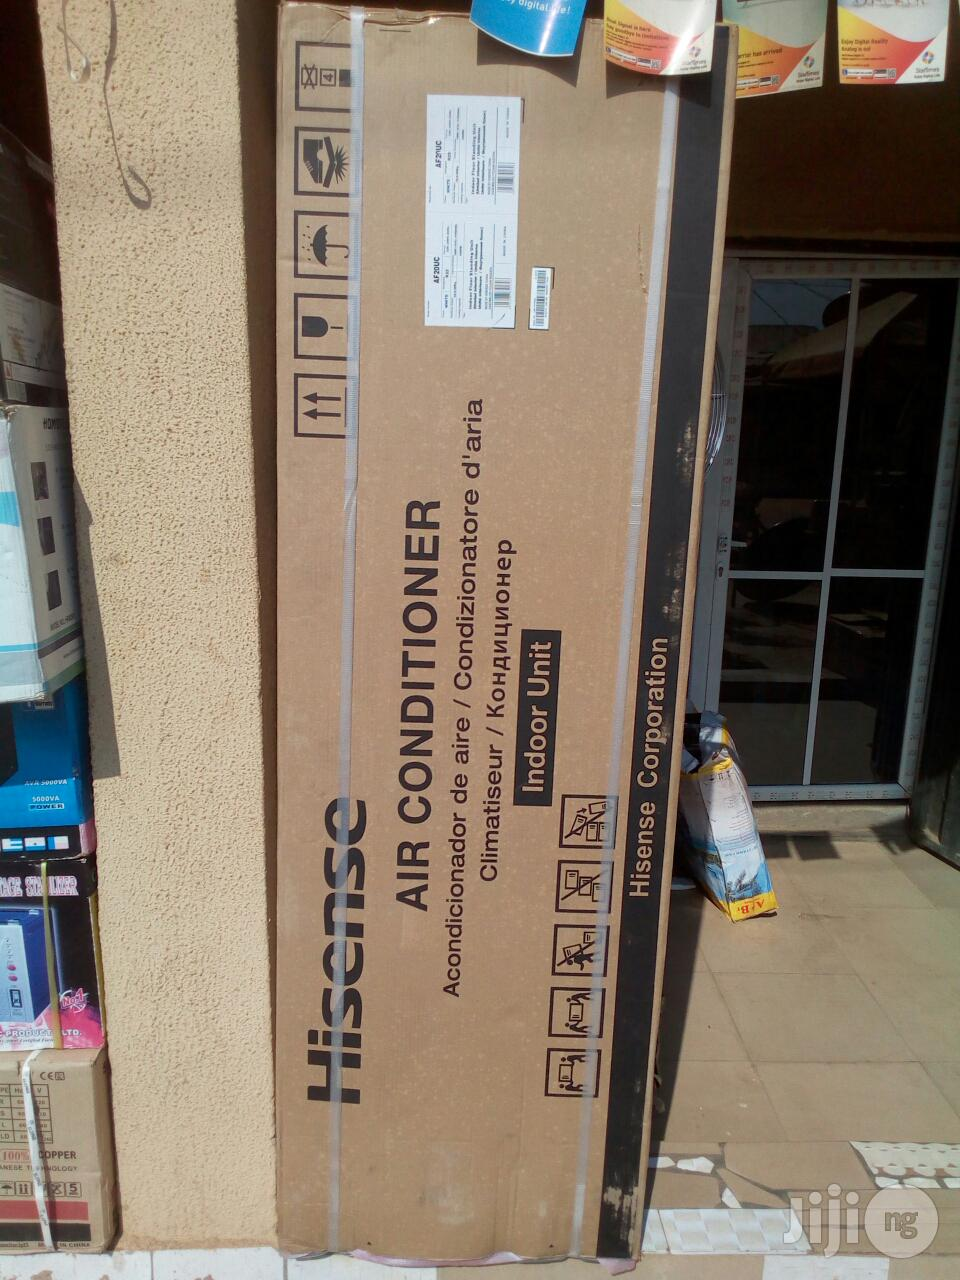 Hisense Standing Air Conditioner 2HP